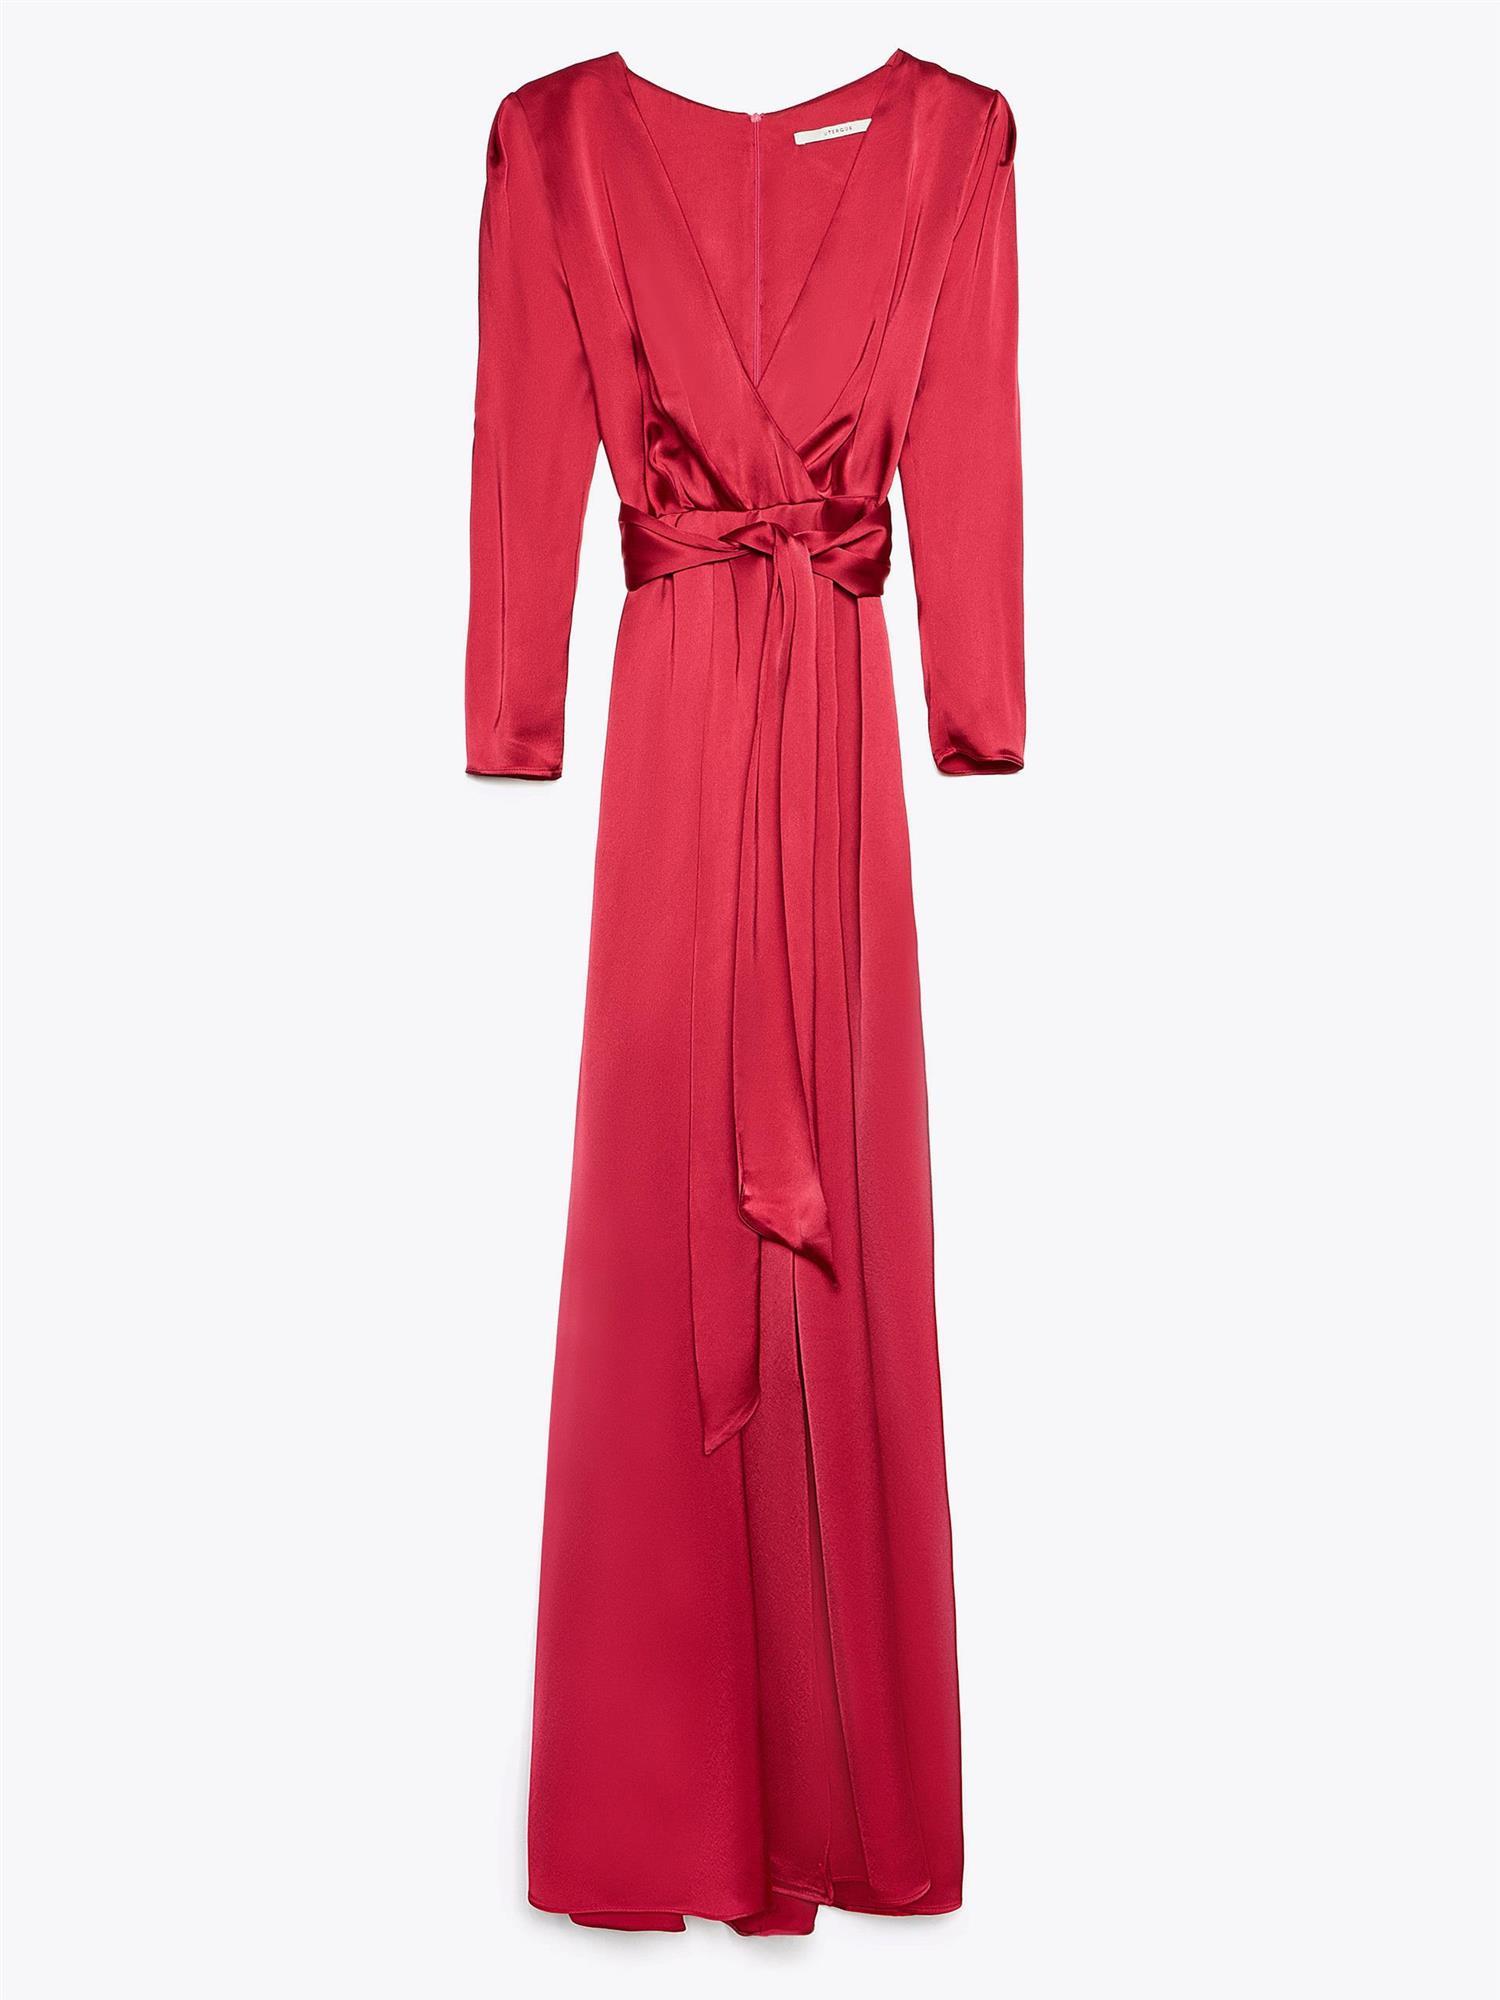 f8628f76db6 8-vestido-largo-rojo-uterque. Vestido largo rojo